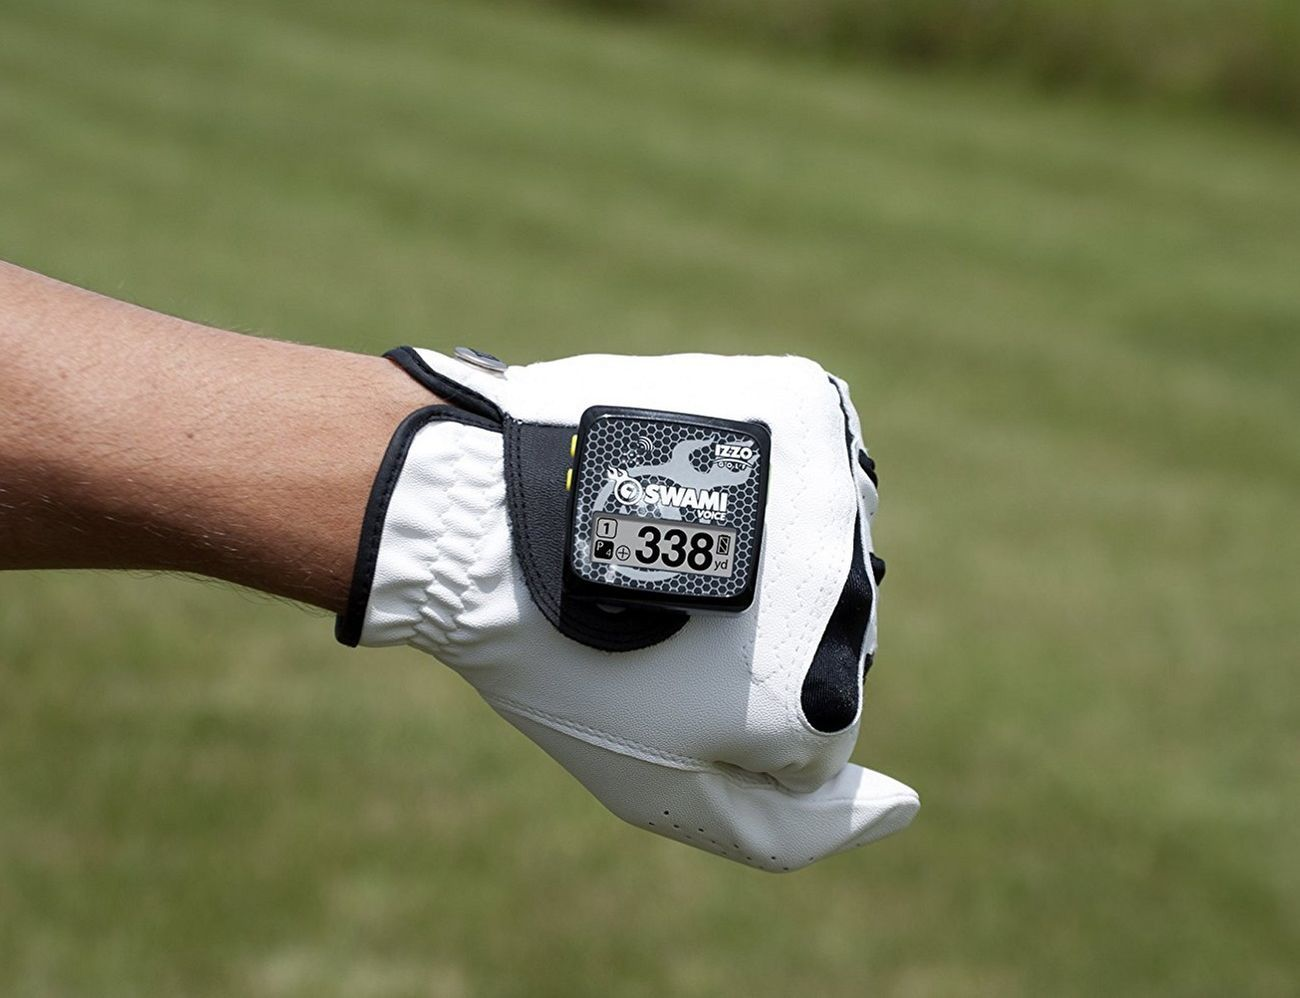 Izzo SWAMI Voice Golf GPS Unit